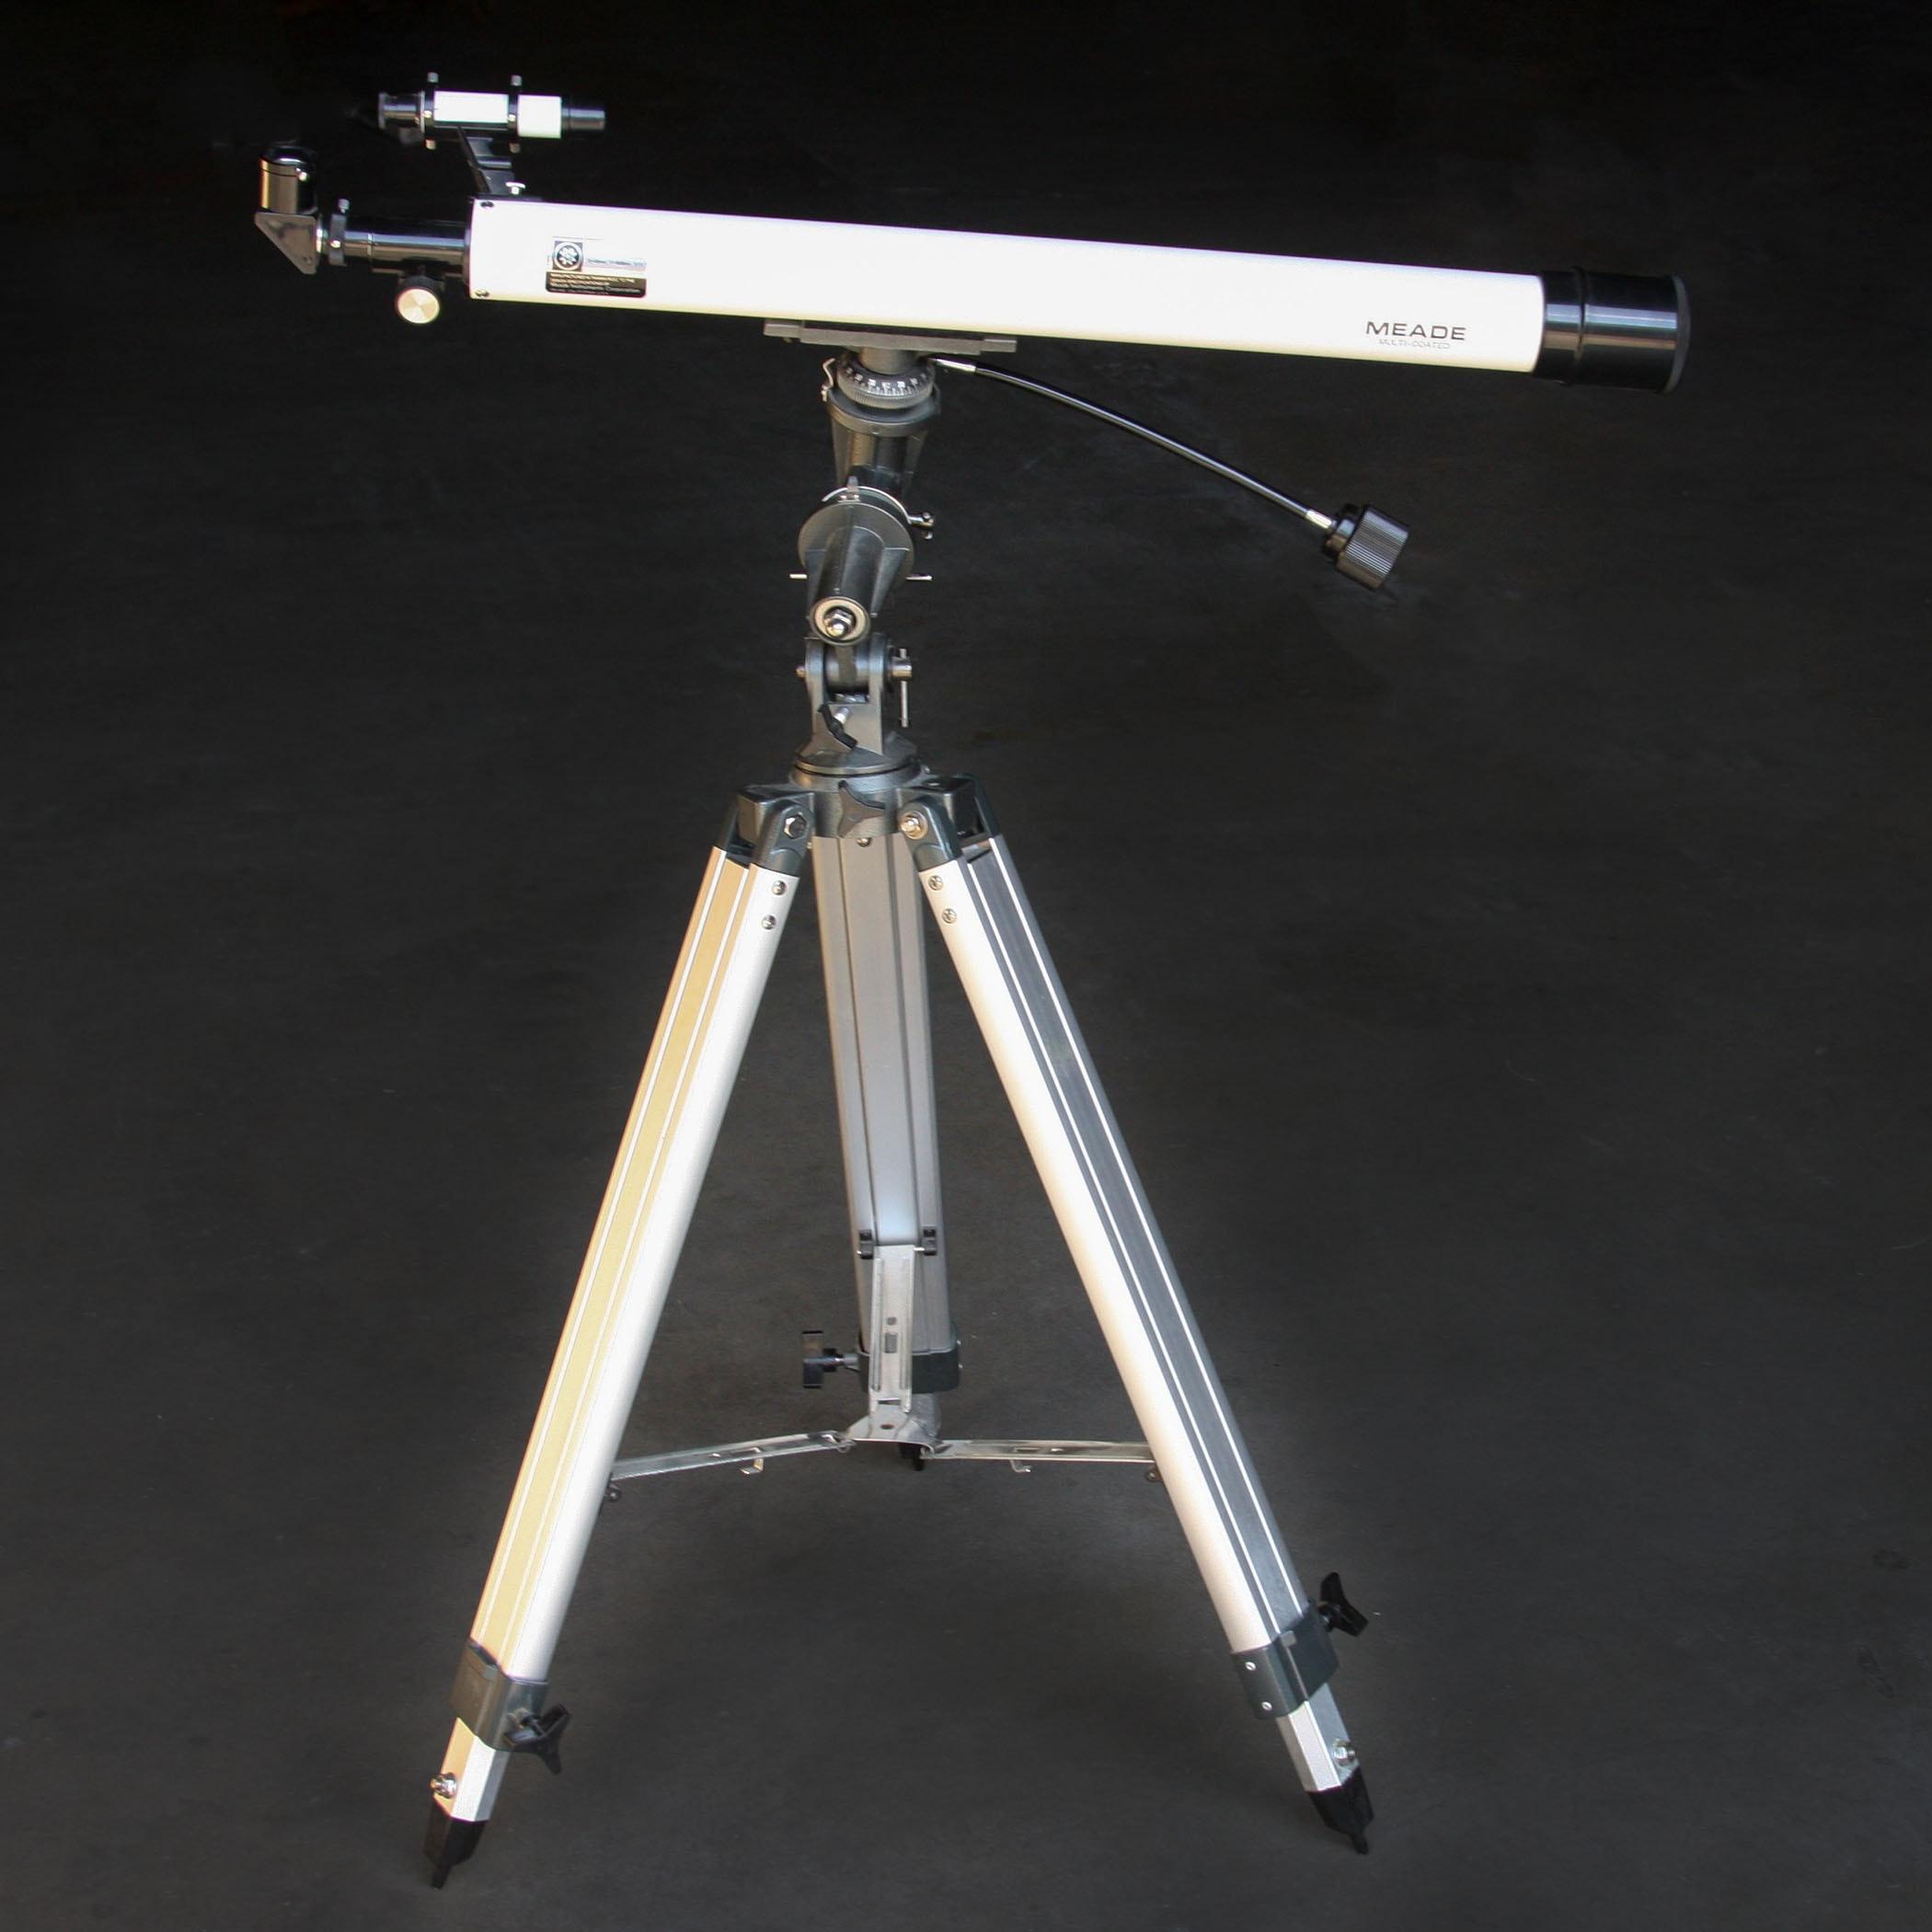 Meade Model 285 Telescope